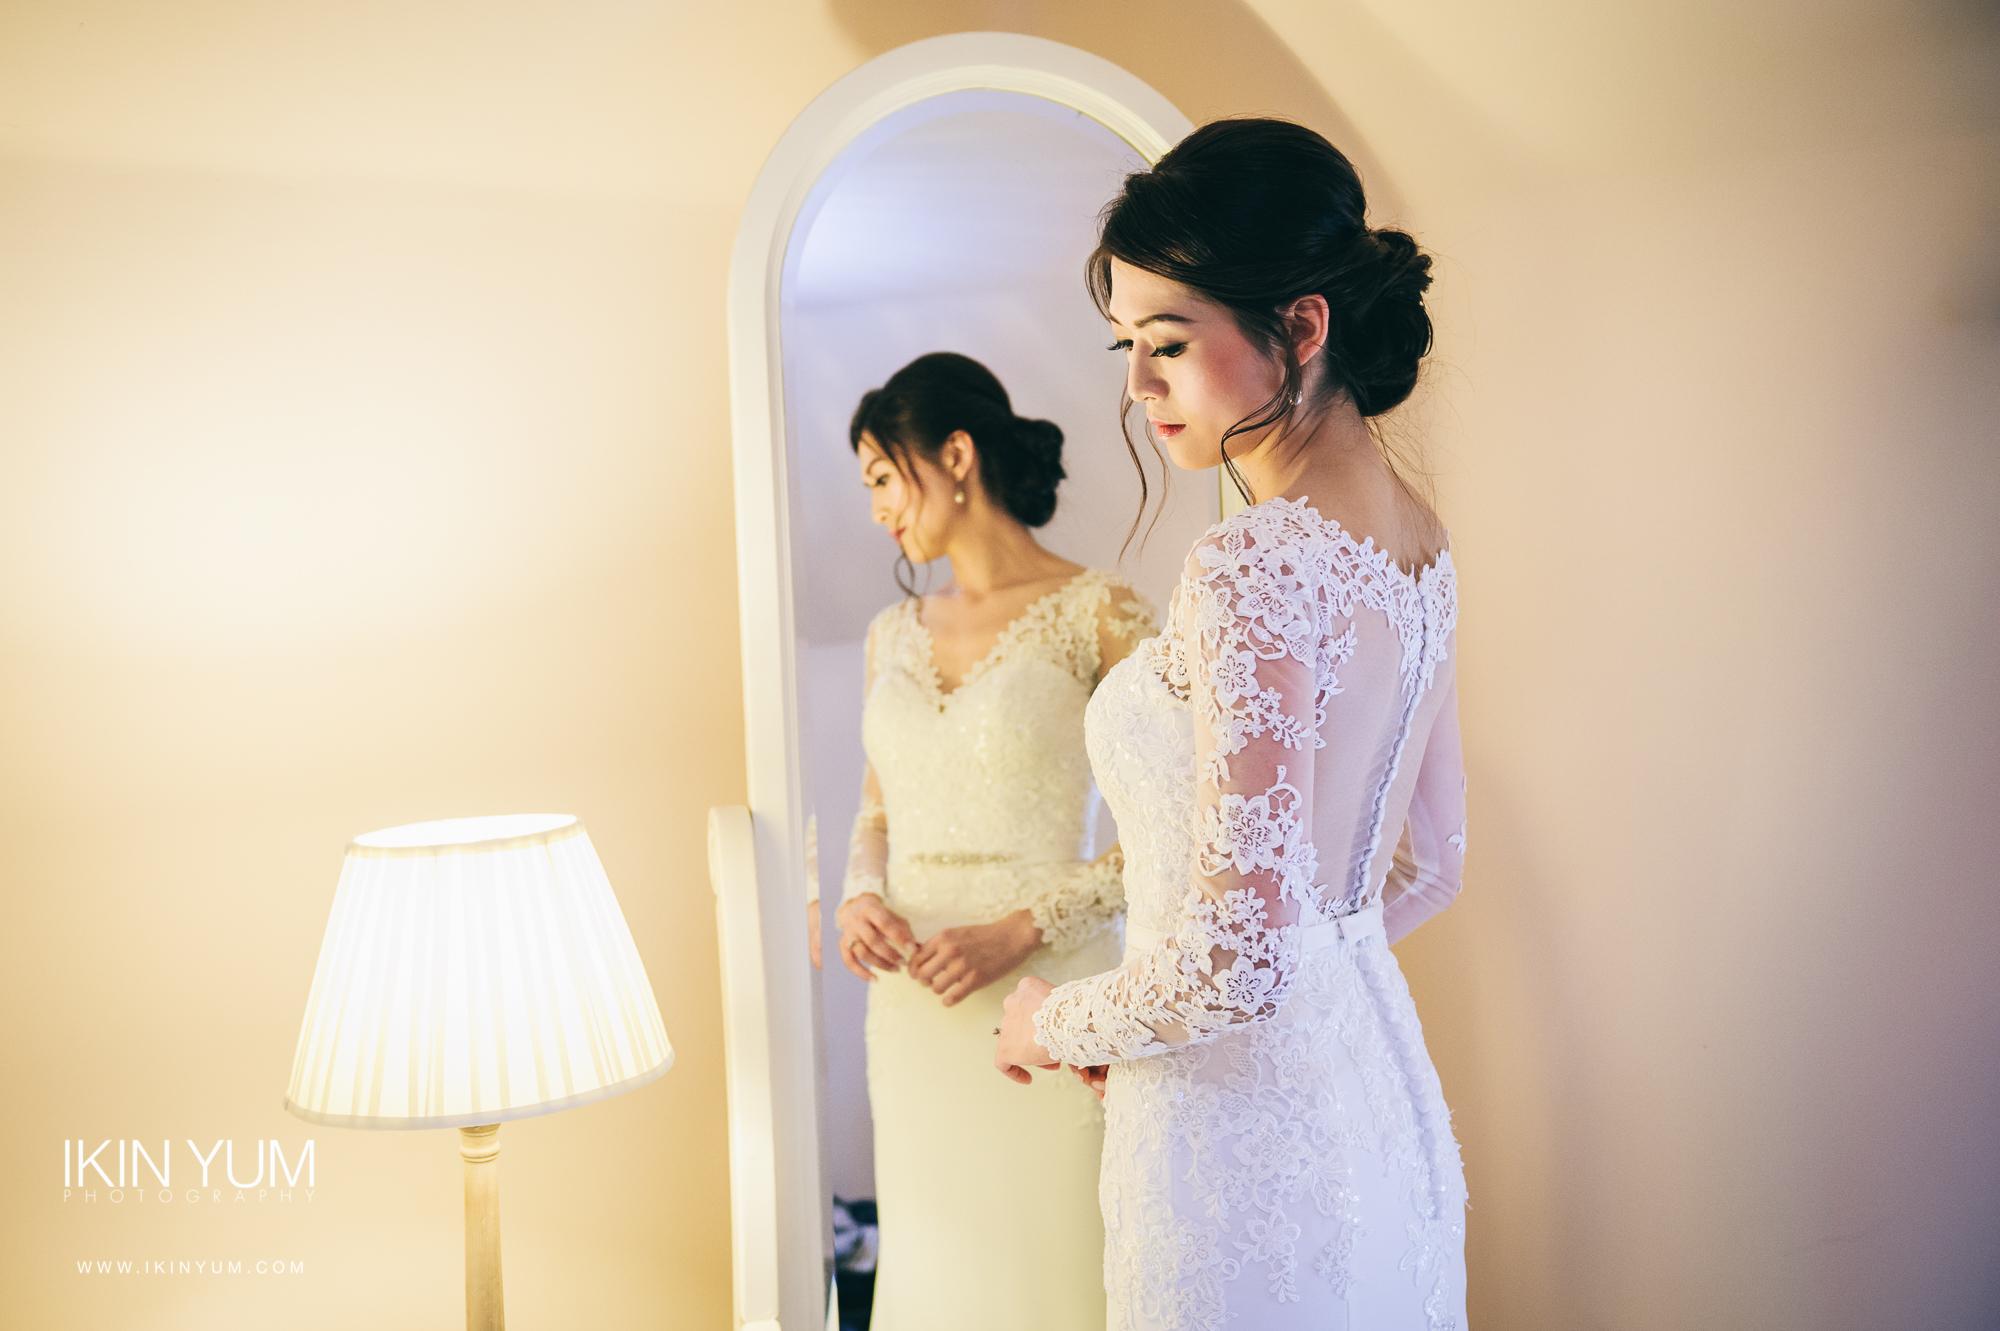 Gaynes park - wedding - Ikin Yum Photography-066.jpg